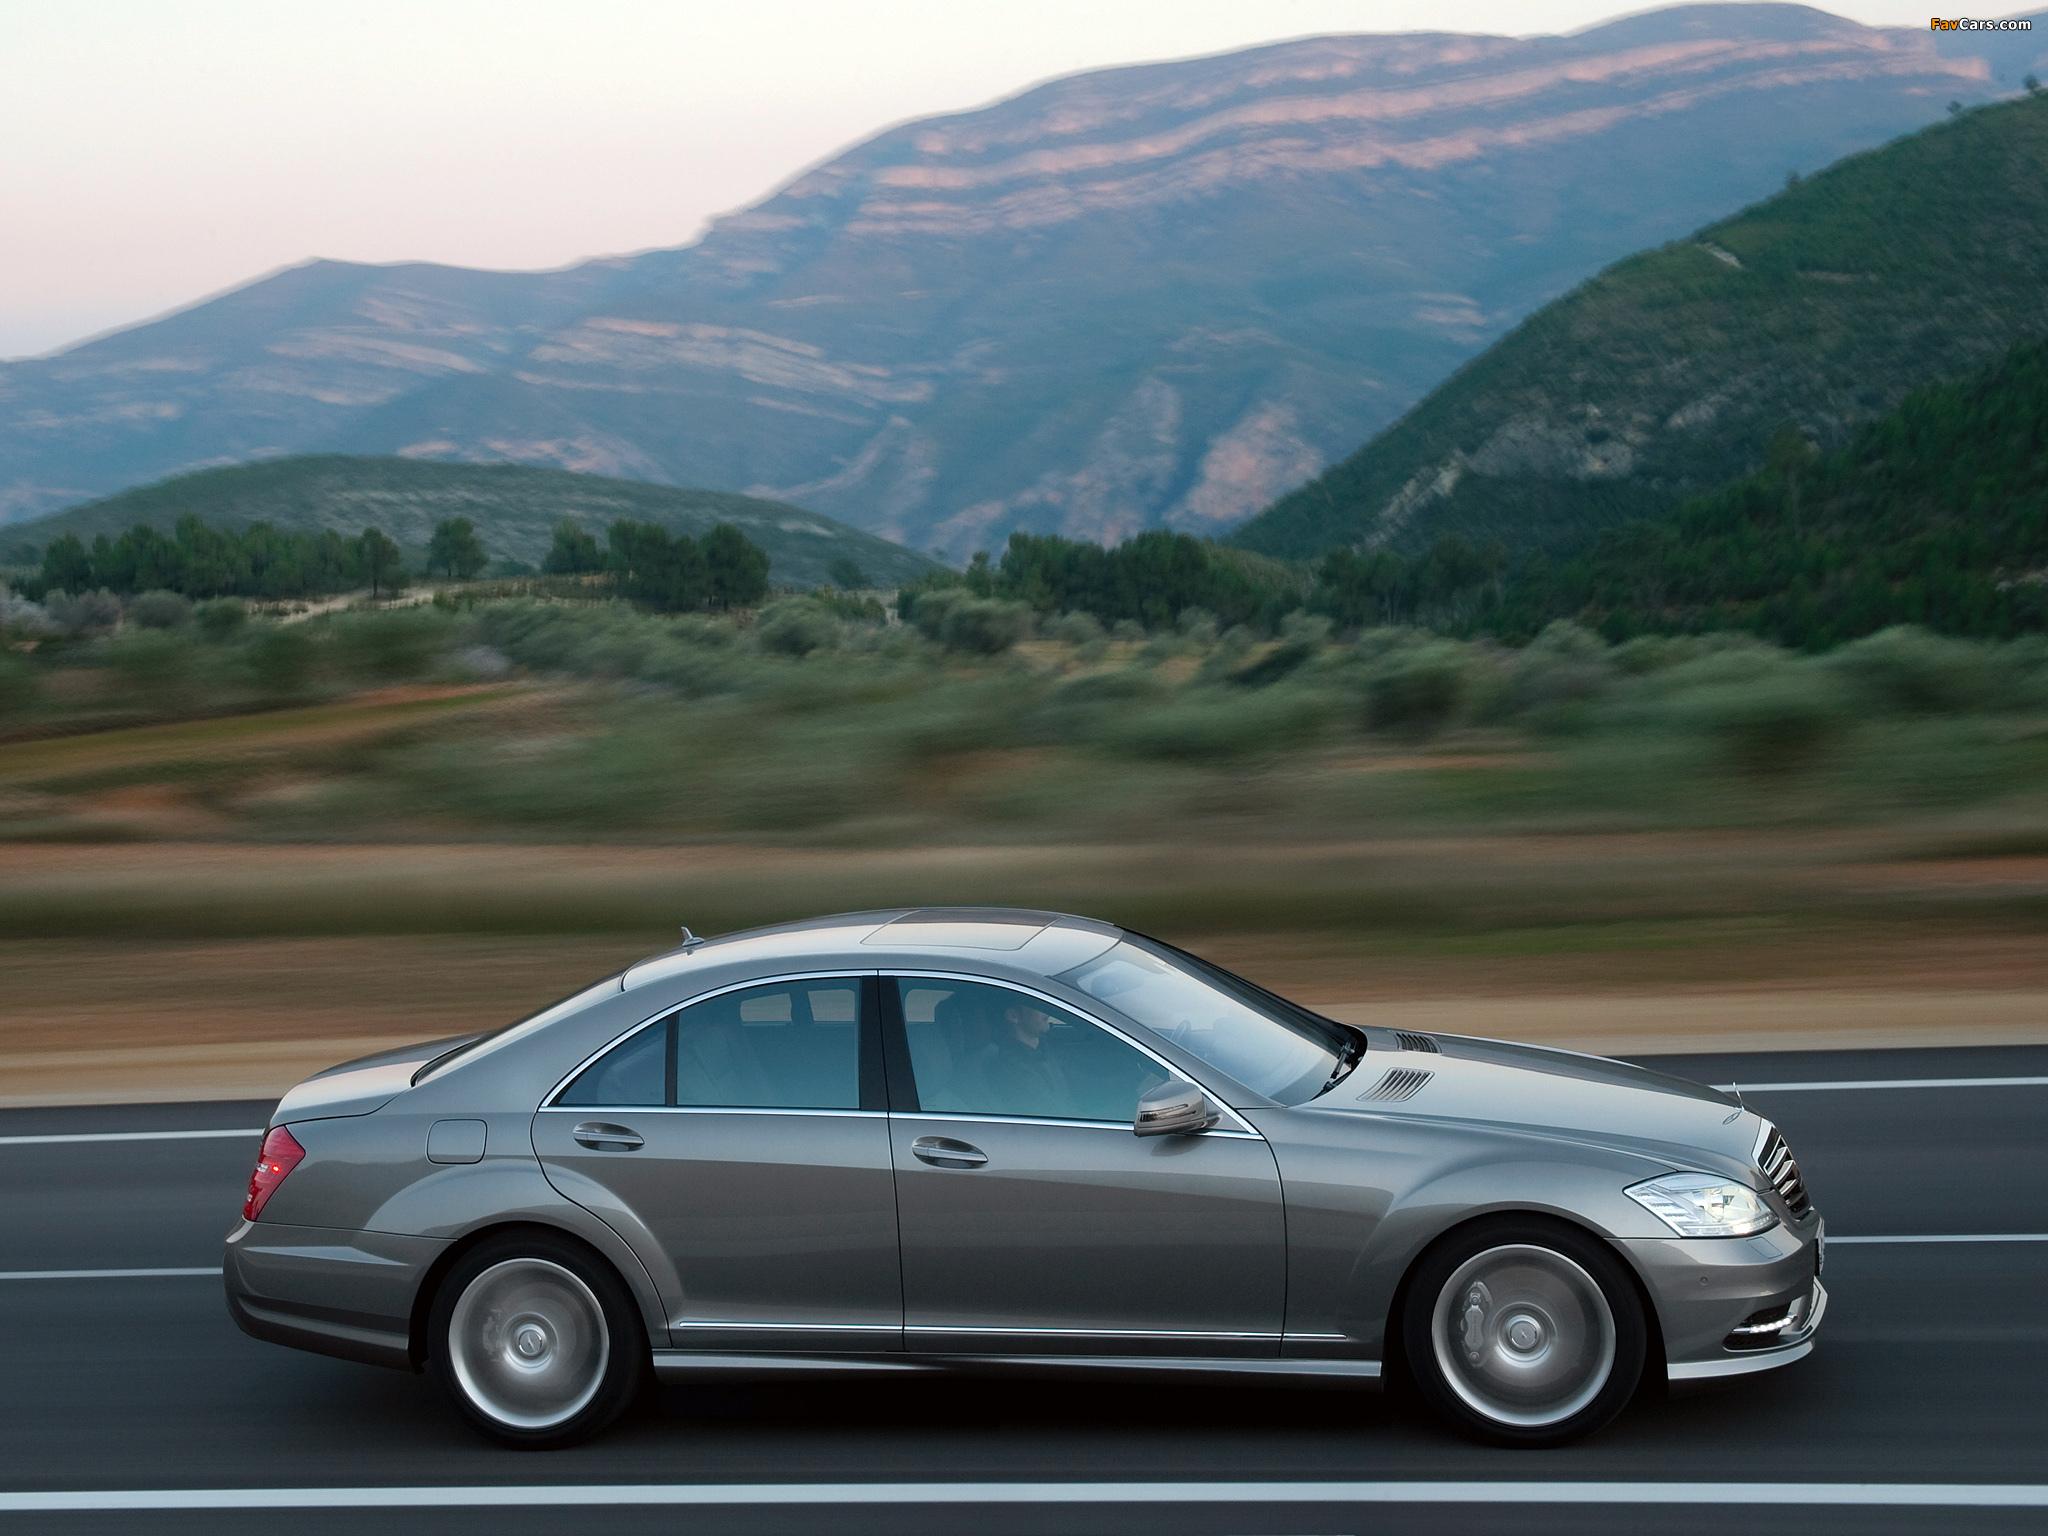 mercedes benz s klasse s 500 4matic best car review. Black Bedroom Furniture Sets. Home Design Ideas